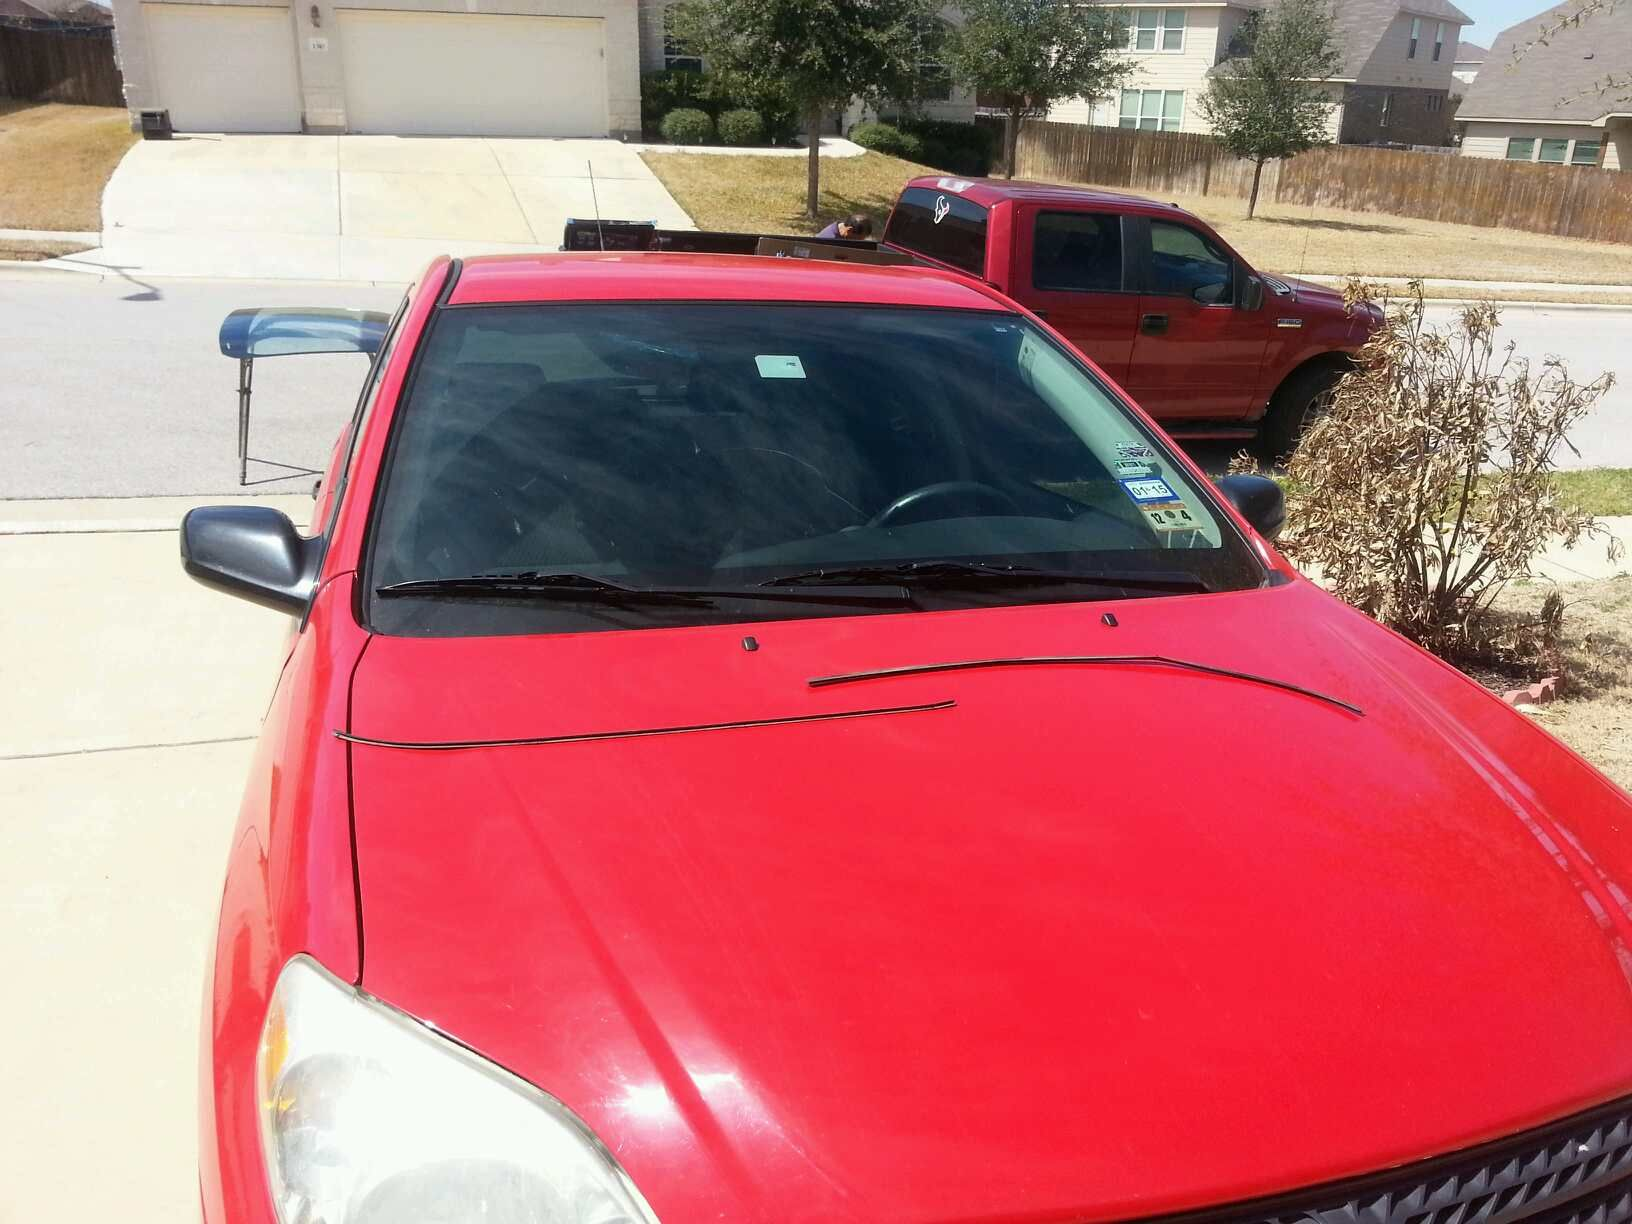 Toyota Celica Windshield Replacement >> 2008 Toyota Matrix Windshield